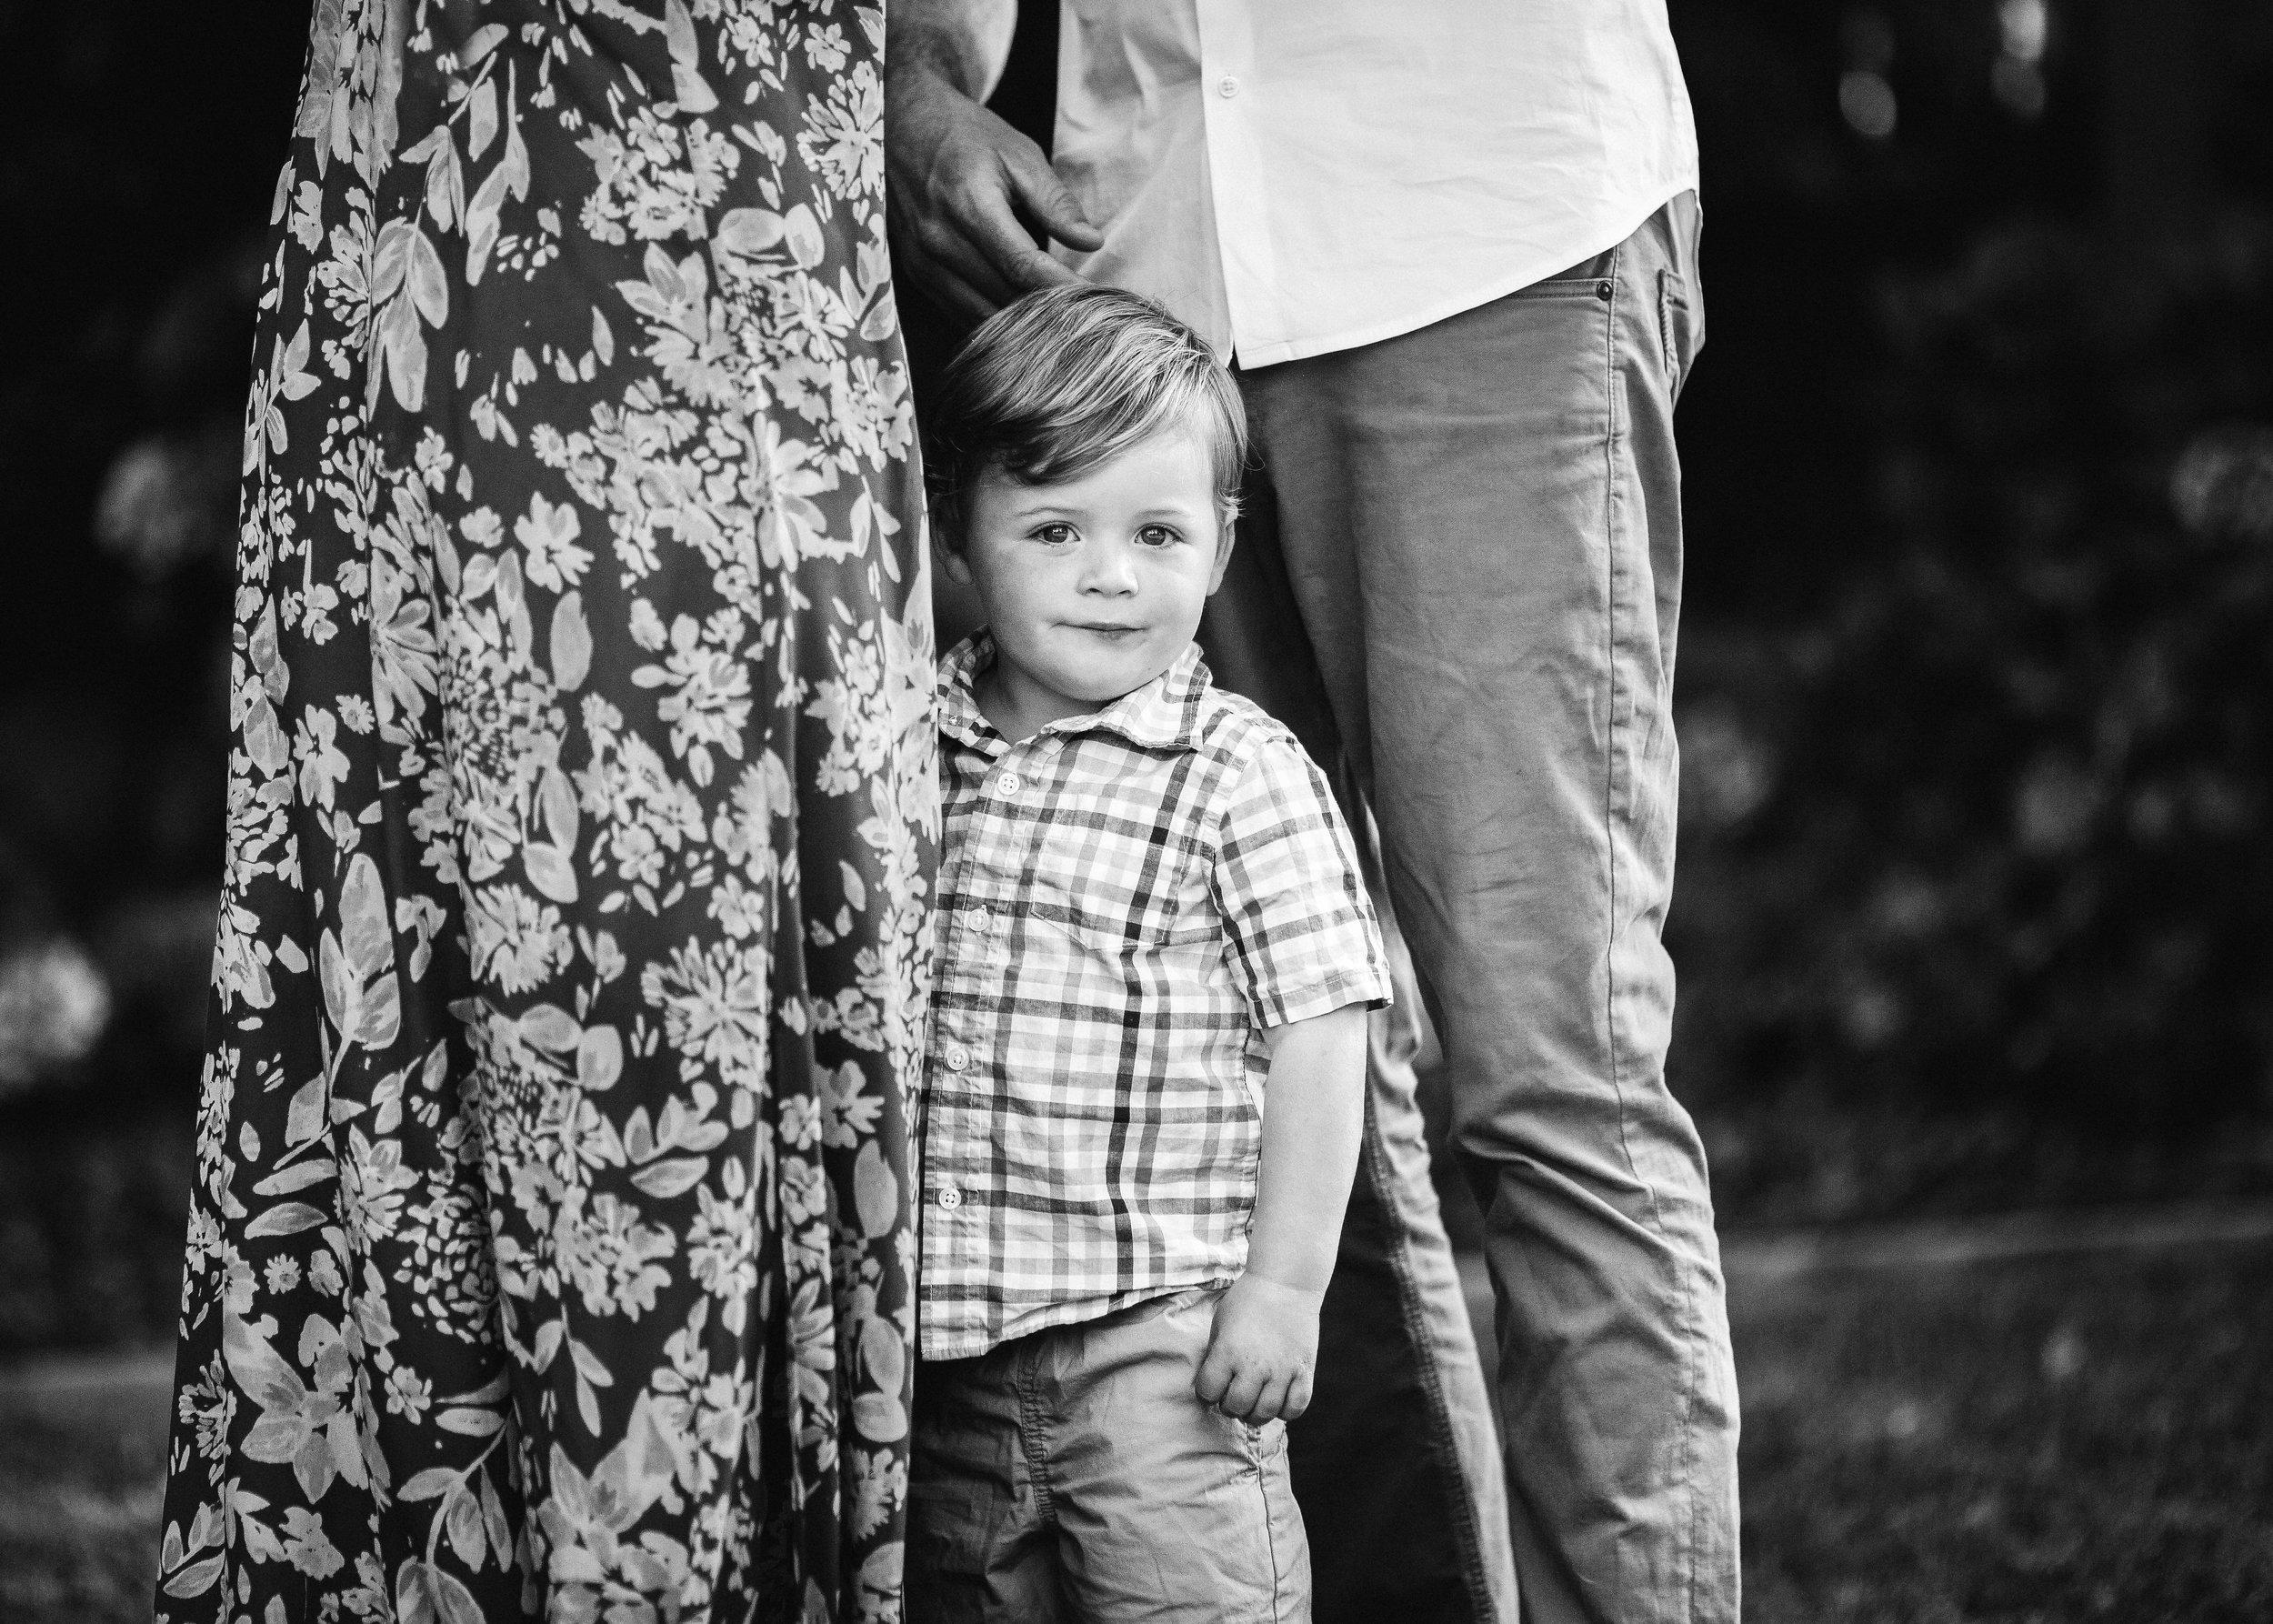 NicolaLevine_NorthShore Portrait Photographer_Chicago family photographer_ Chilren's photographer, North Shore photographer, Deerfield Family photographer, Deerfield lifestyle photographerLG9A7028-Edit.jpg